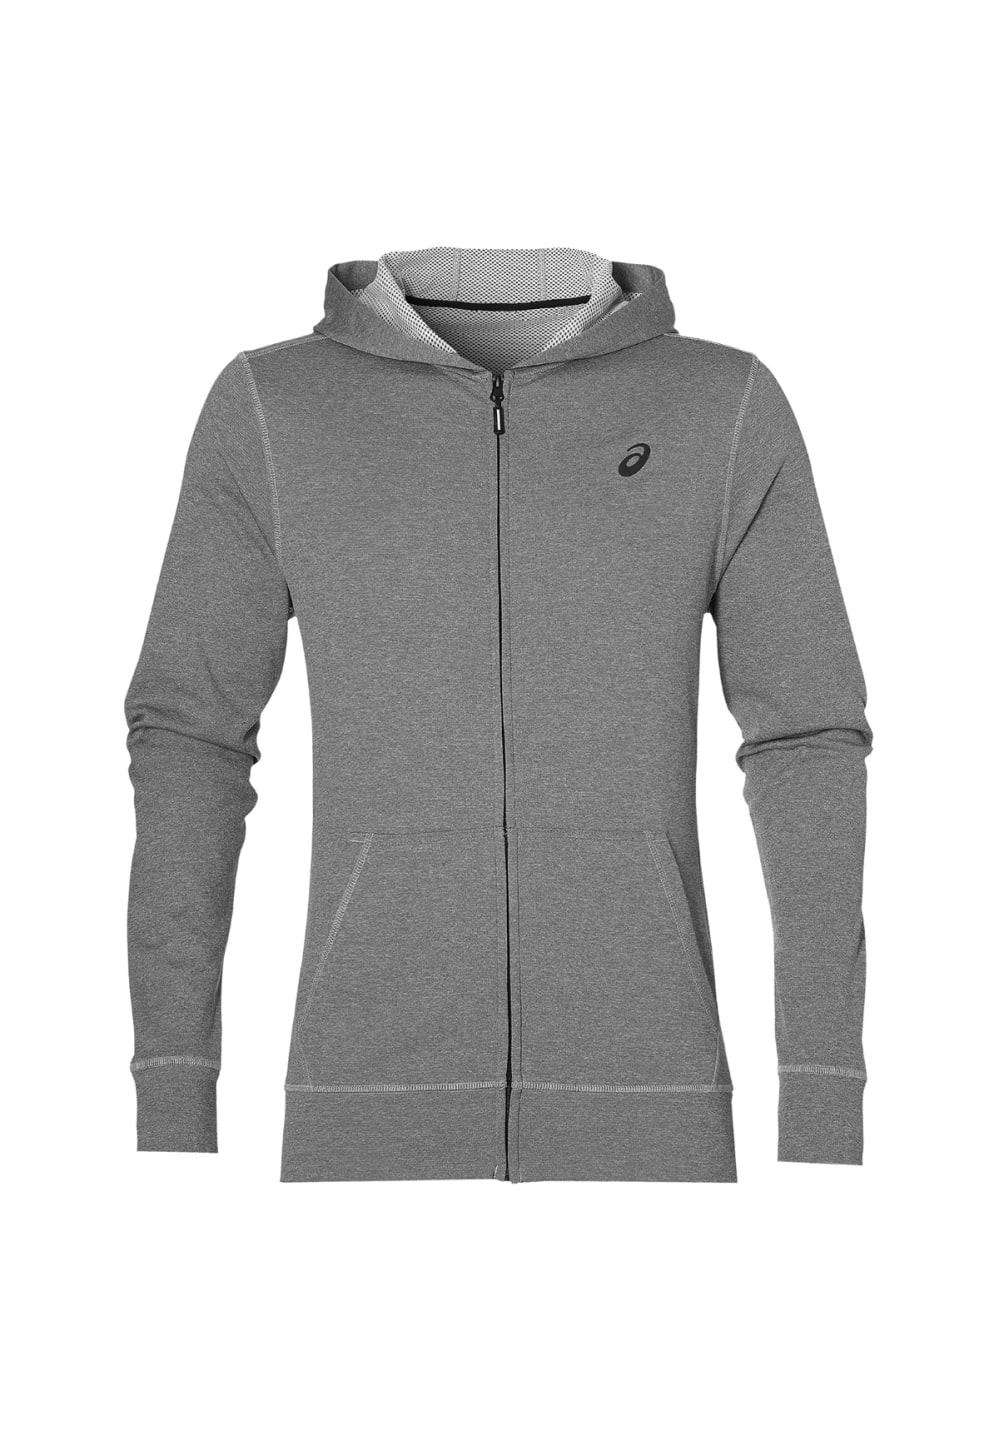 ASICS Tech Fz Hoody - Sweatshirts & Hoodies für Herren - Grau, Gr. XXL